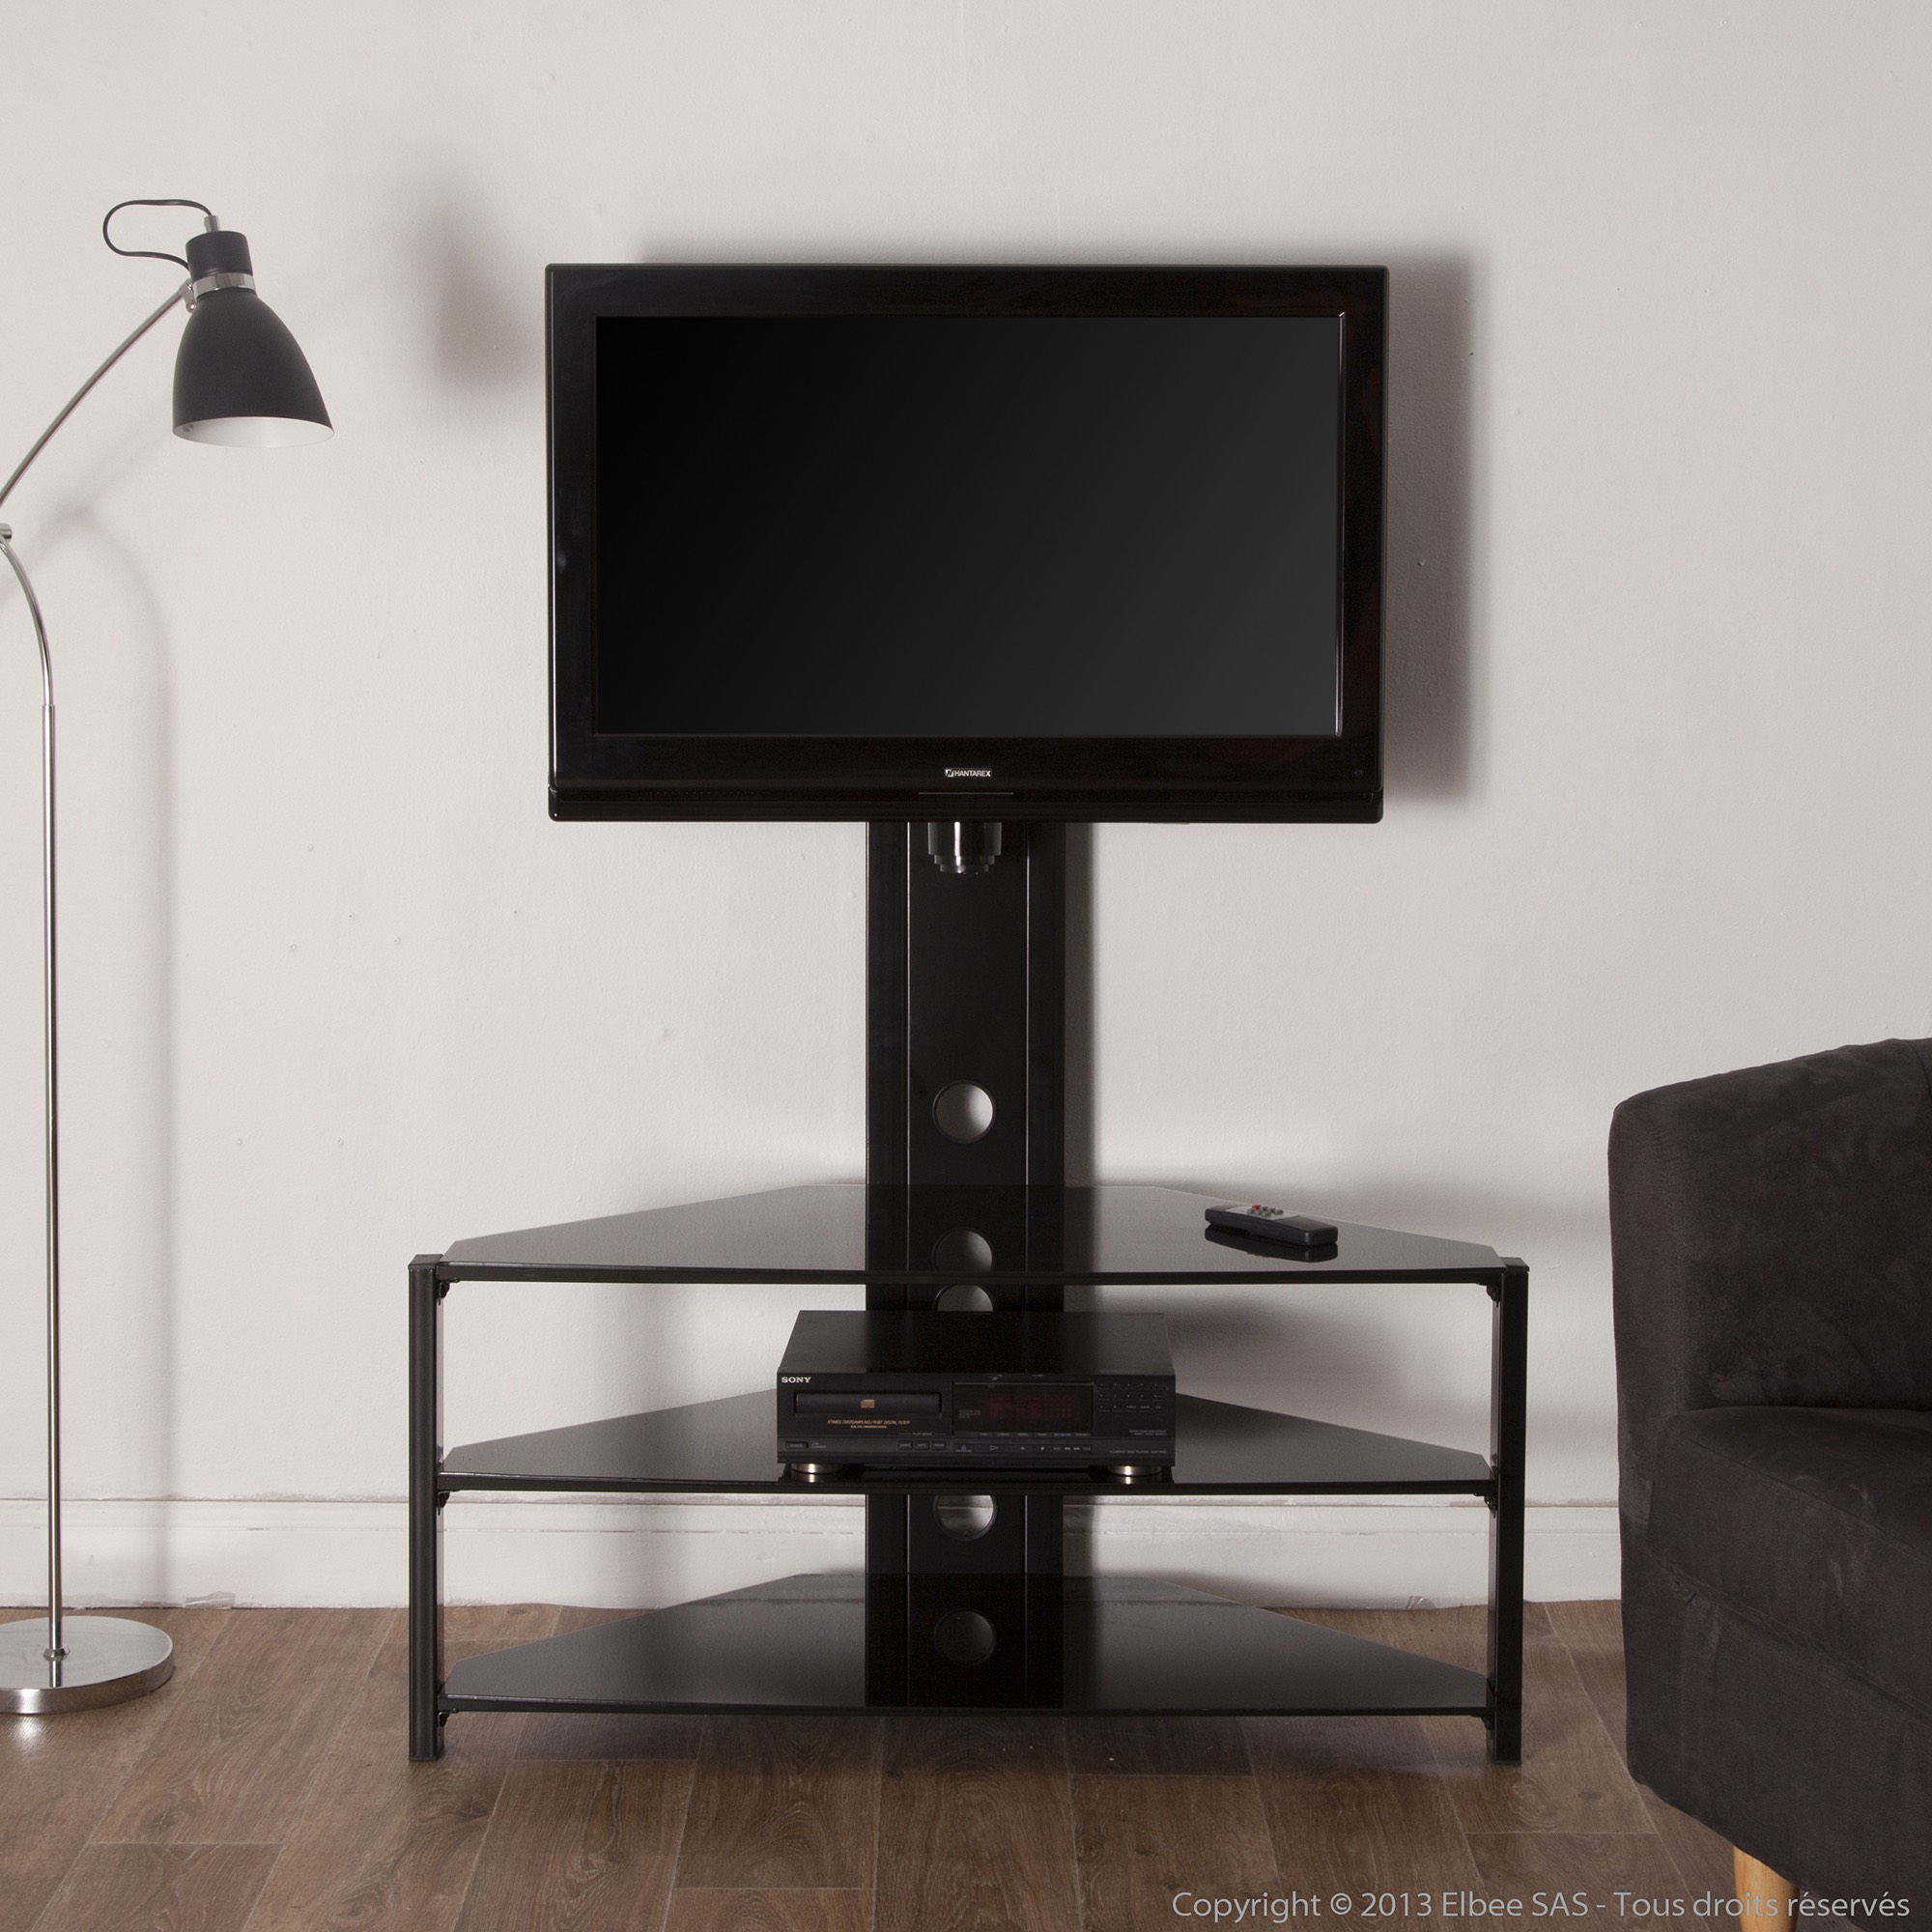 Meuble Tv D Angle Noir Urbantrott Com # Meuble Tv Hifi D Angle Moderne